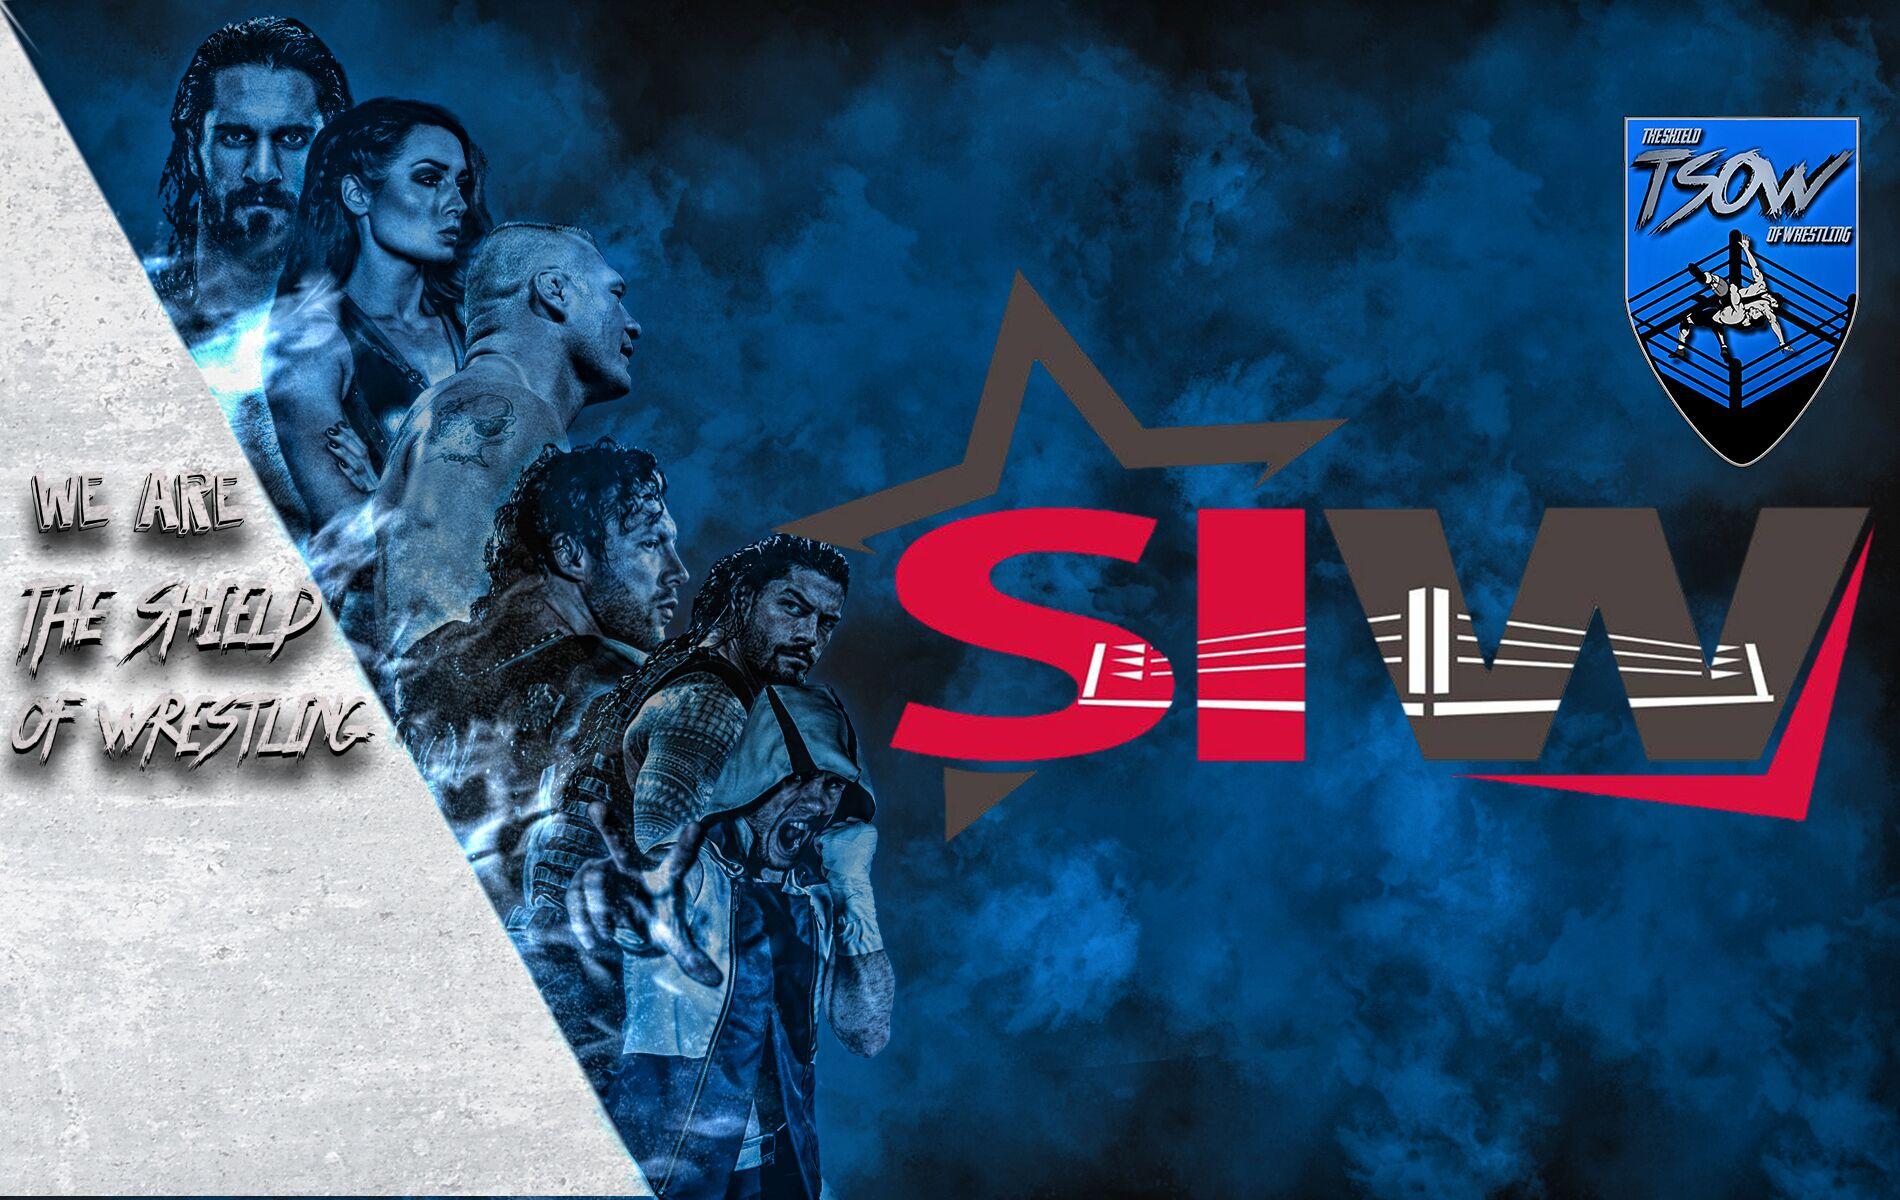 SIW Wrestling Live Roma - SIW a Roma